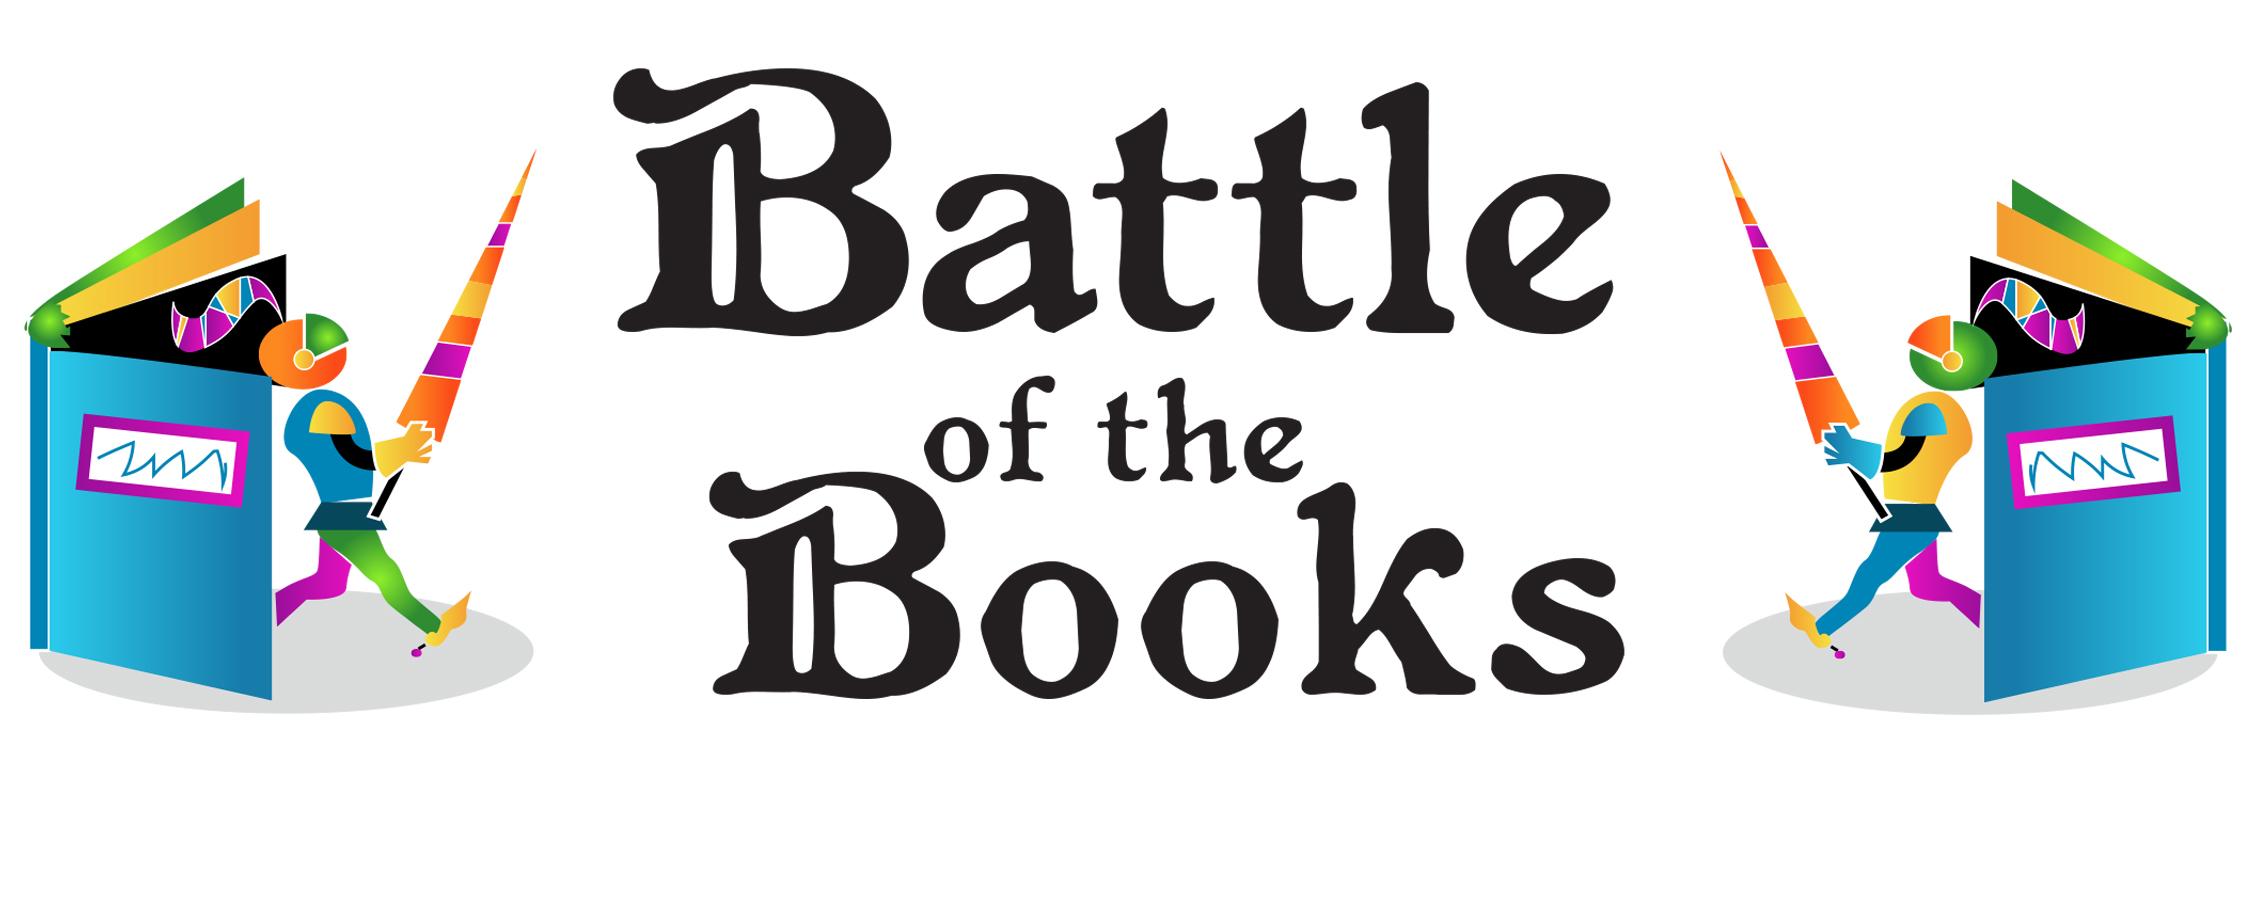 Battle clipart battle the book Of Index /wp the Battle